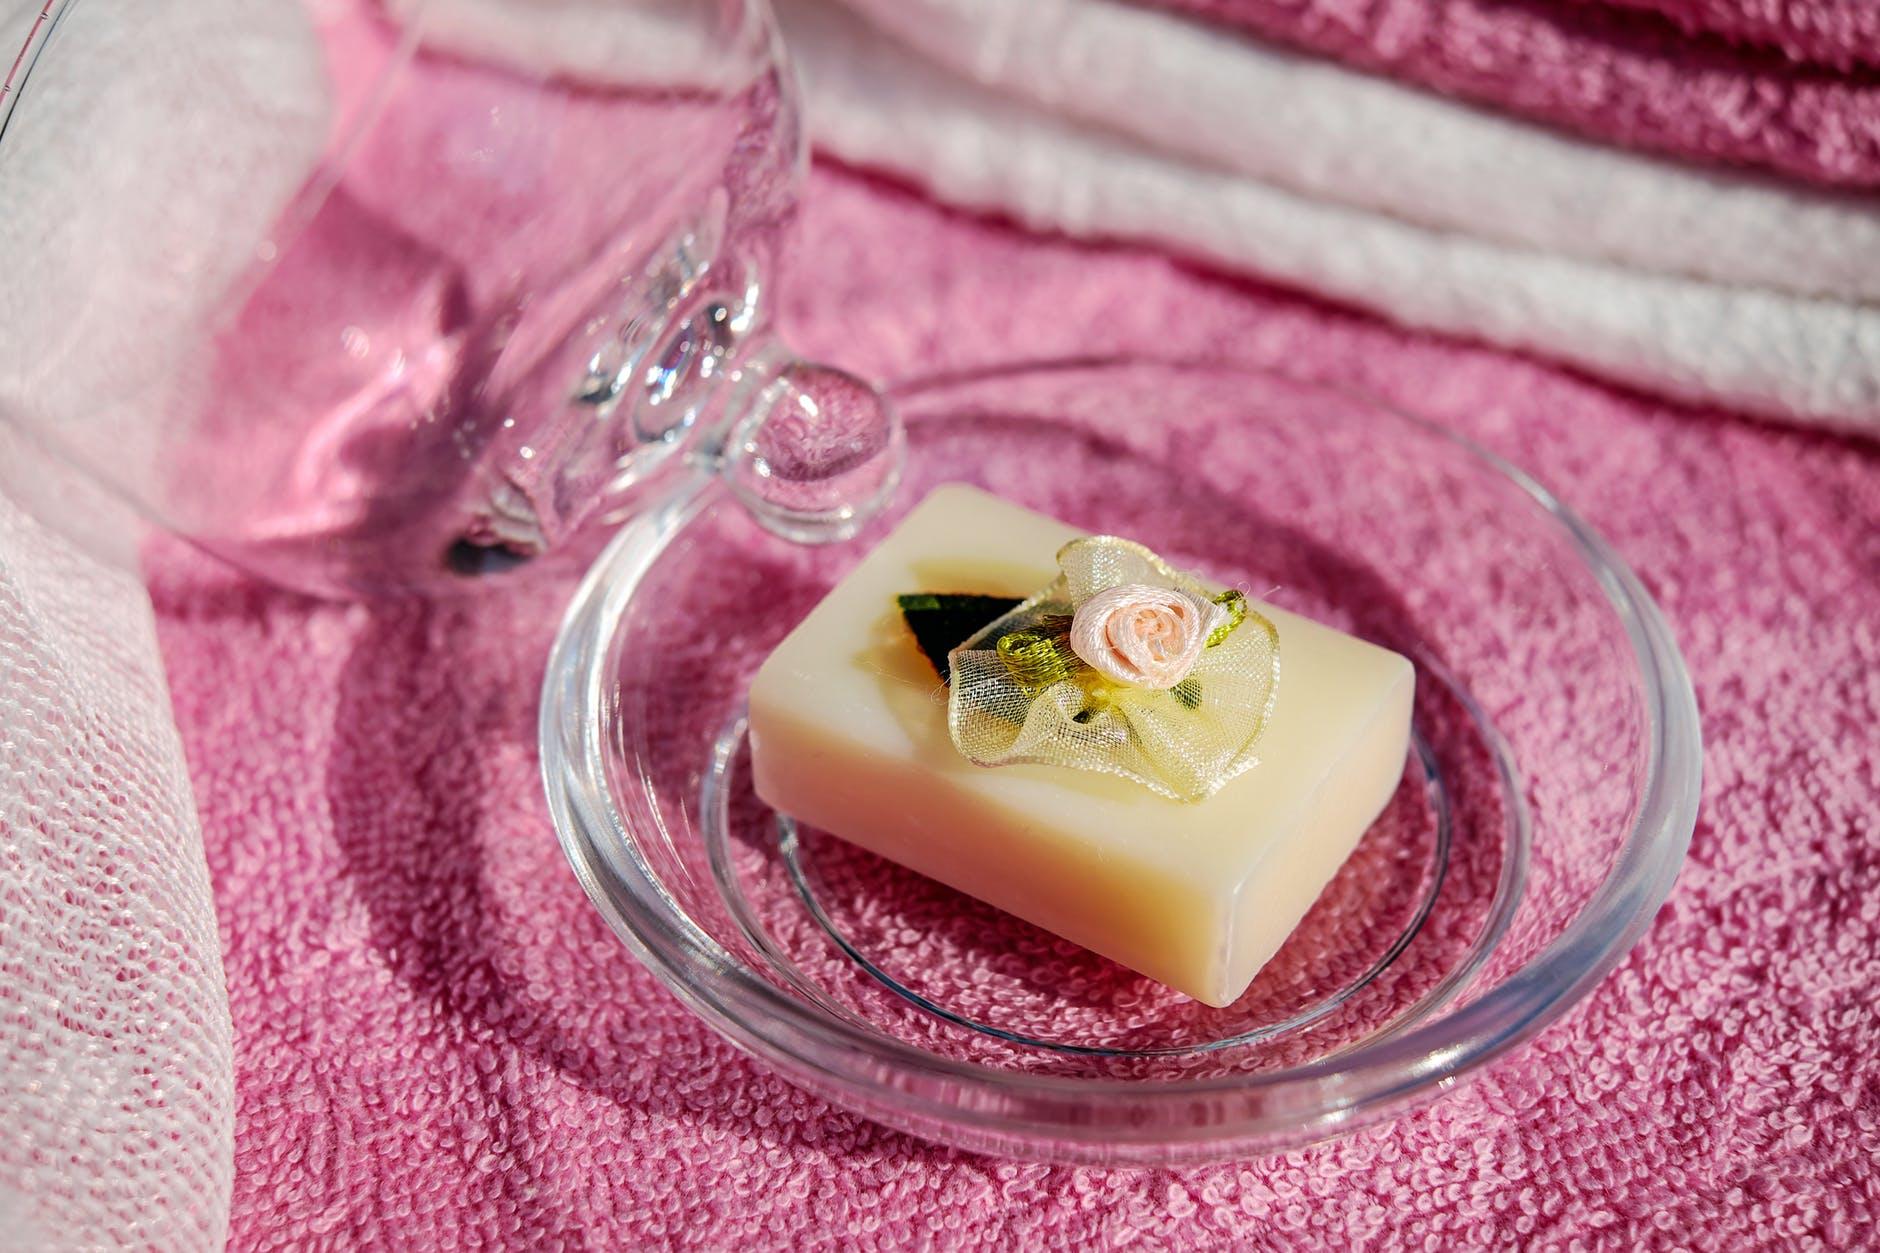 aromatherapy aromatic bath bath towels